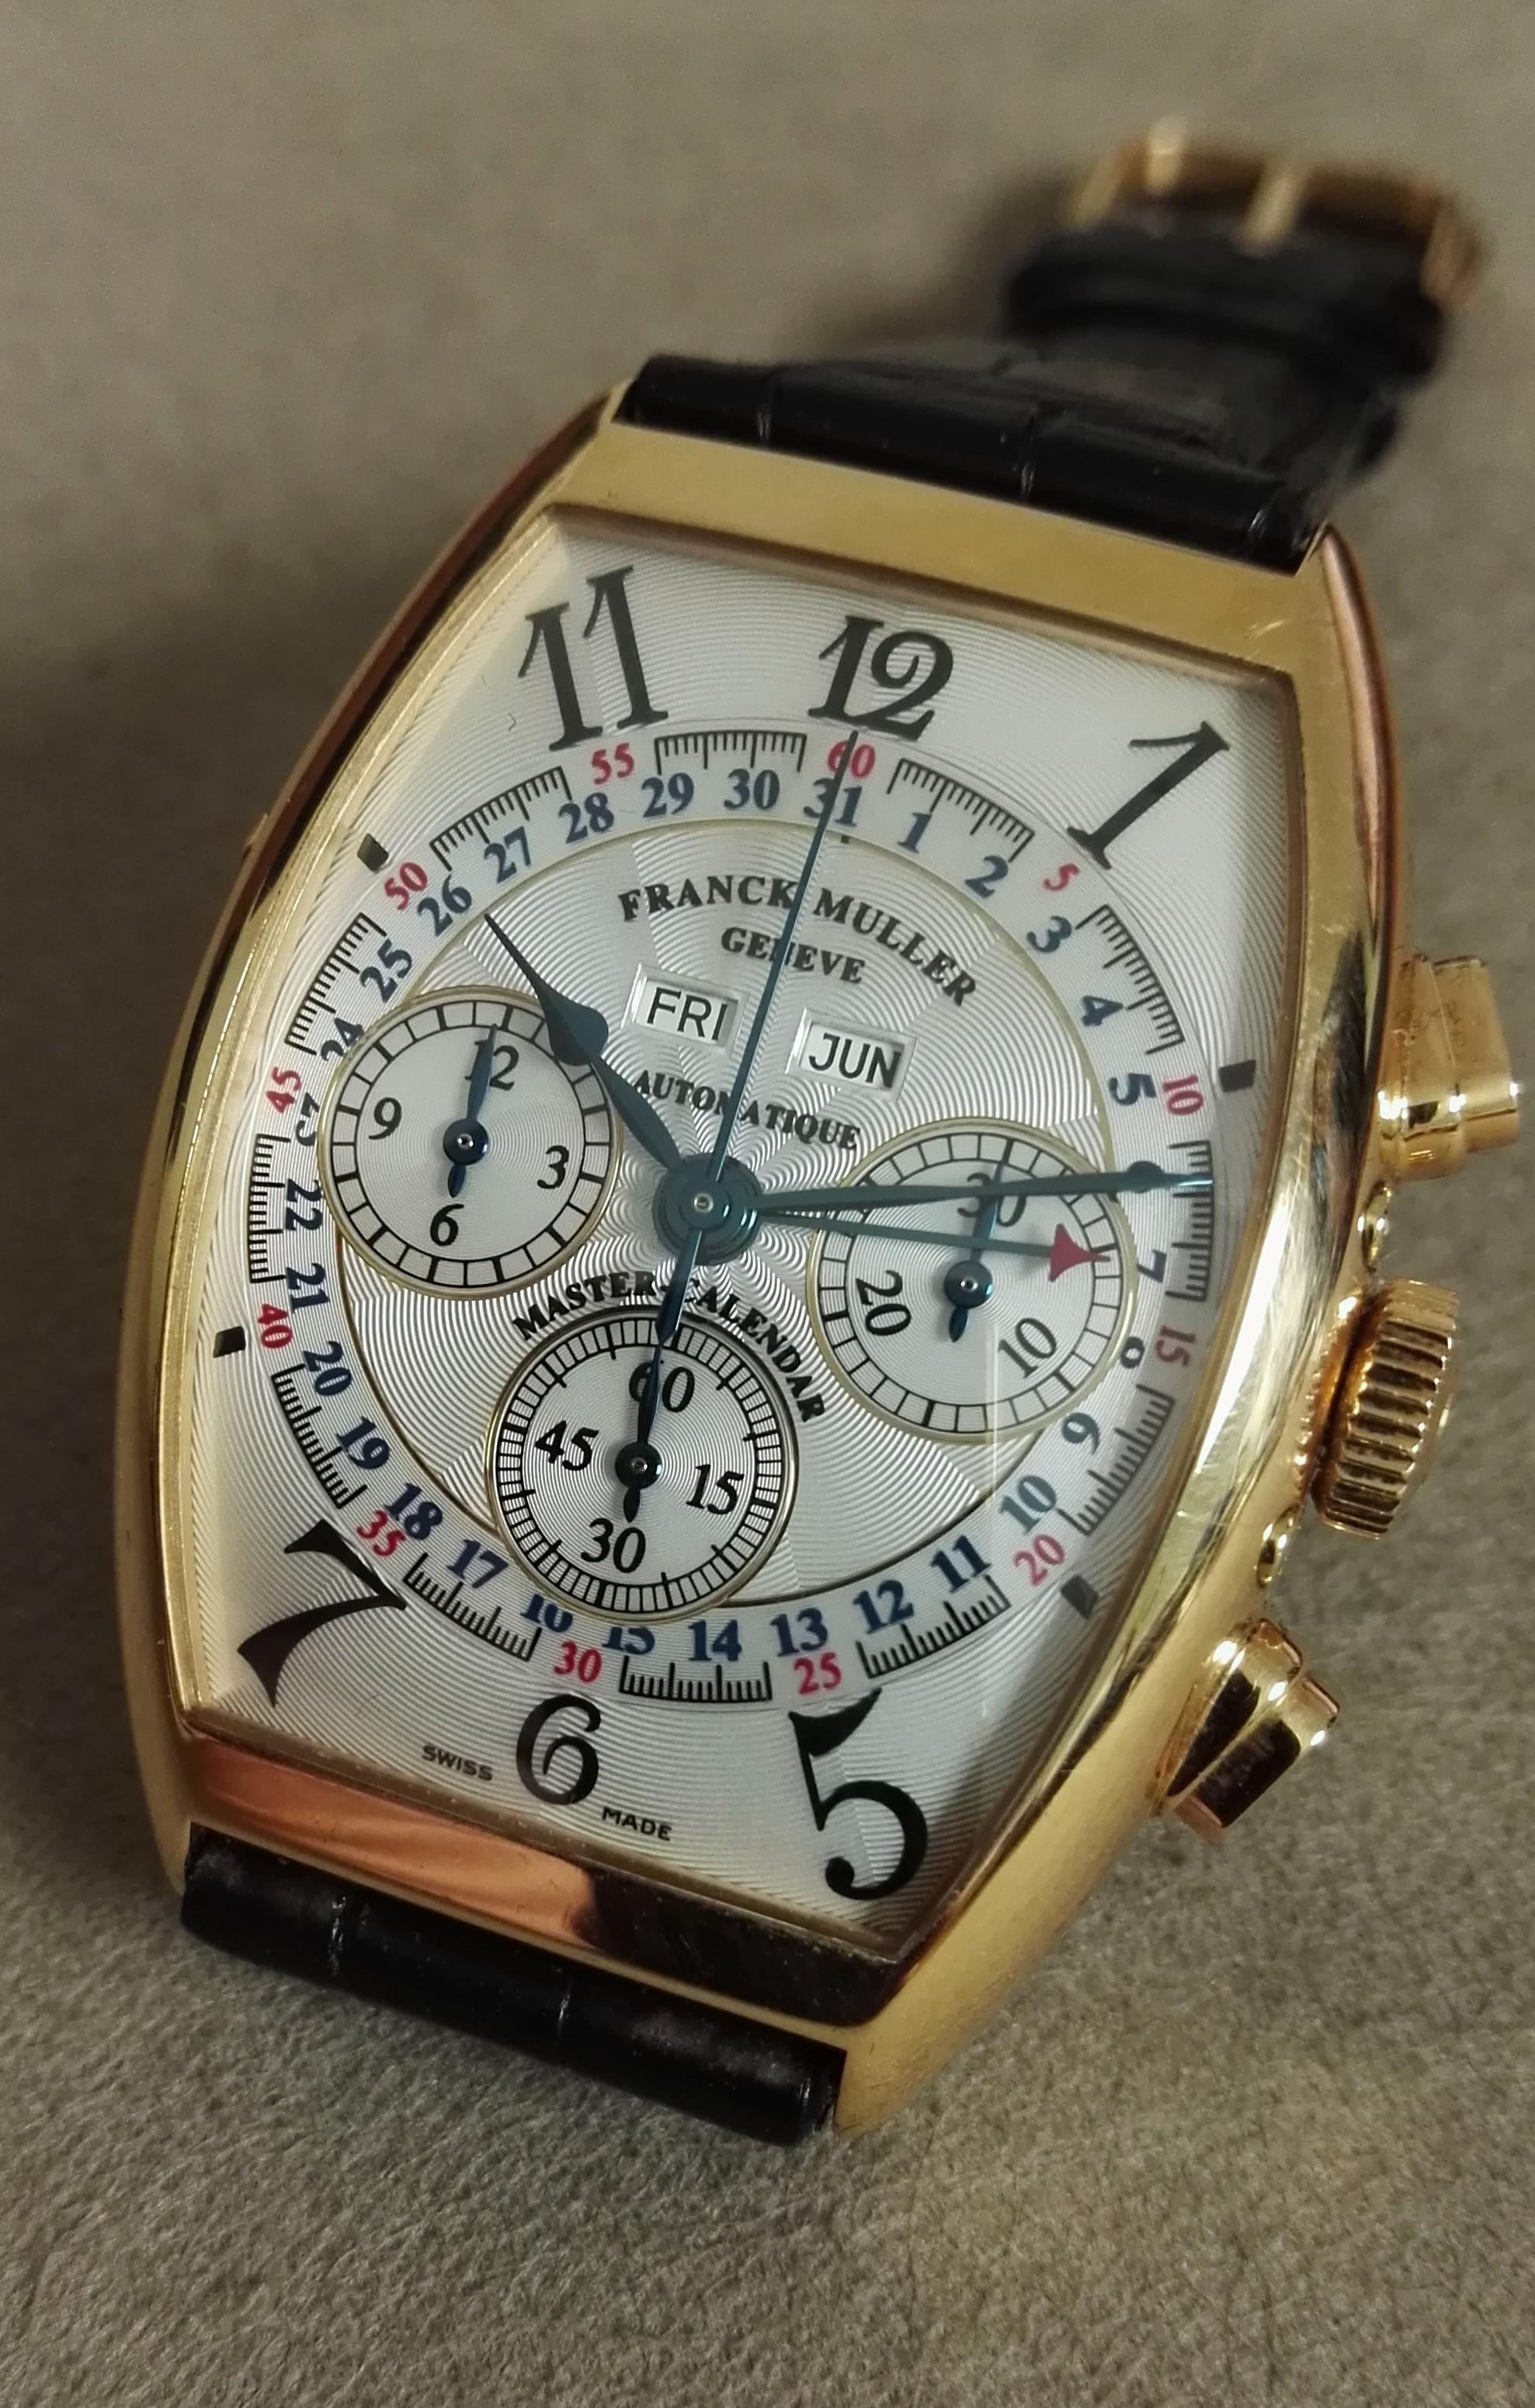 Franck Muller Master Calendar Magnum Chronograph 18K Rose Gold Automatic | San Giorgio a Cremano